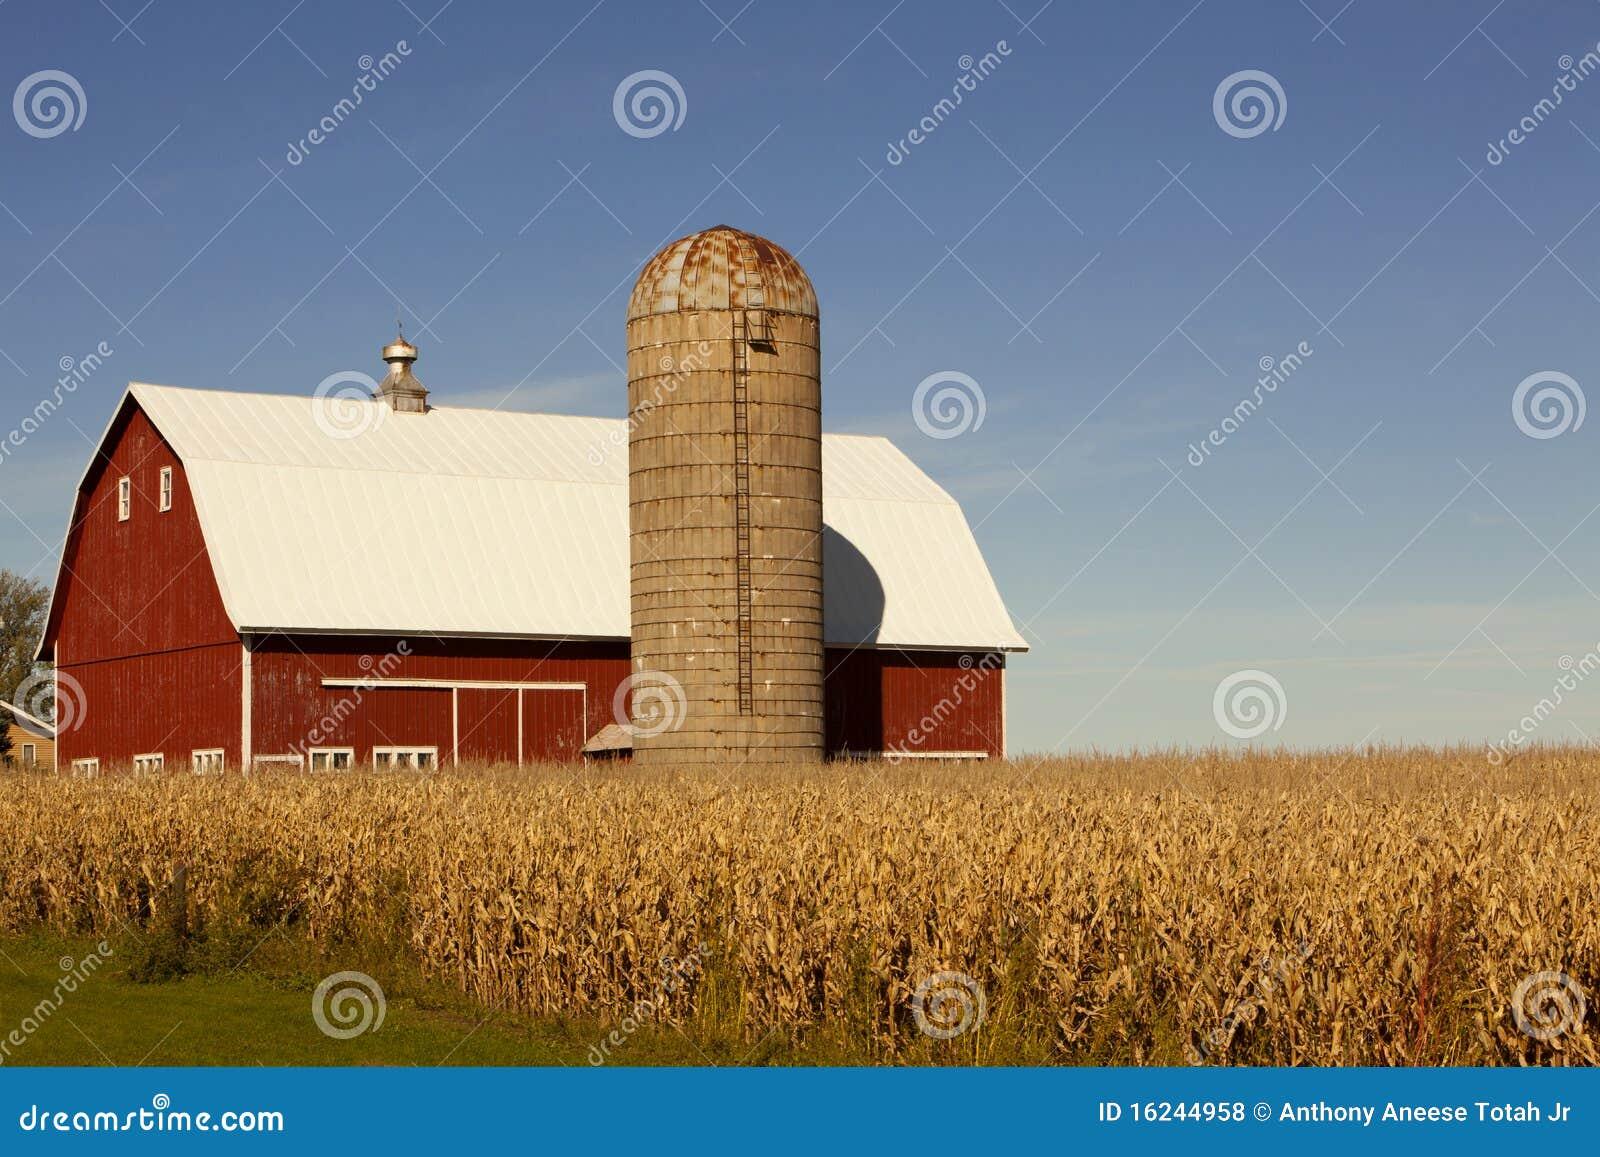 Red Barn, Silo and Corn Field